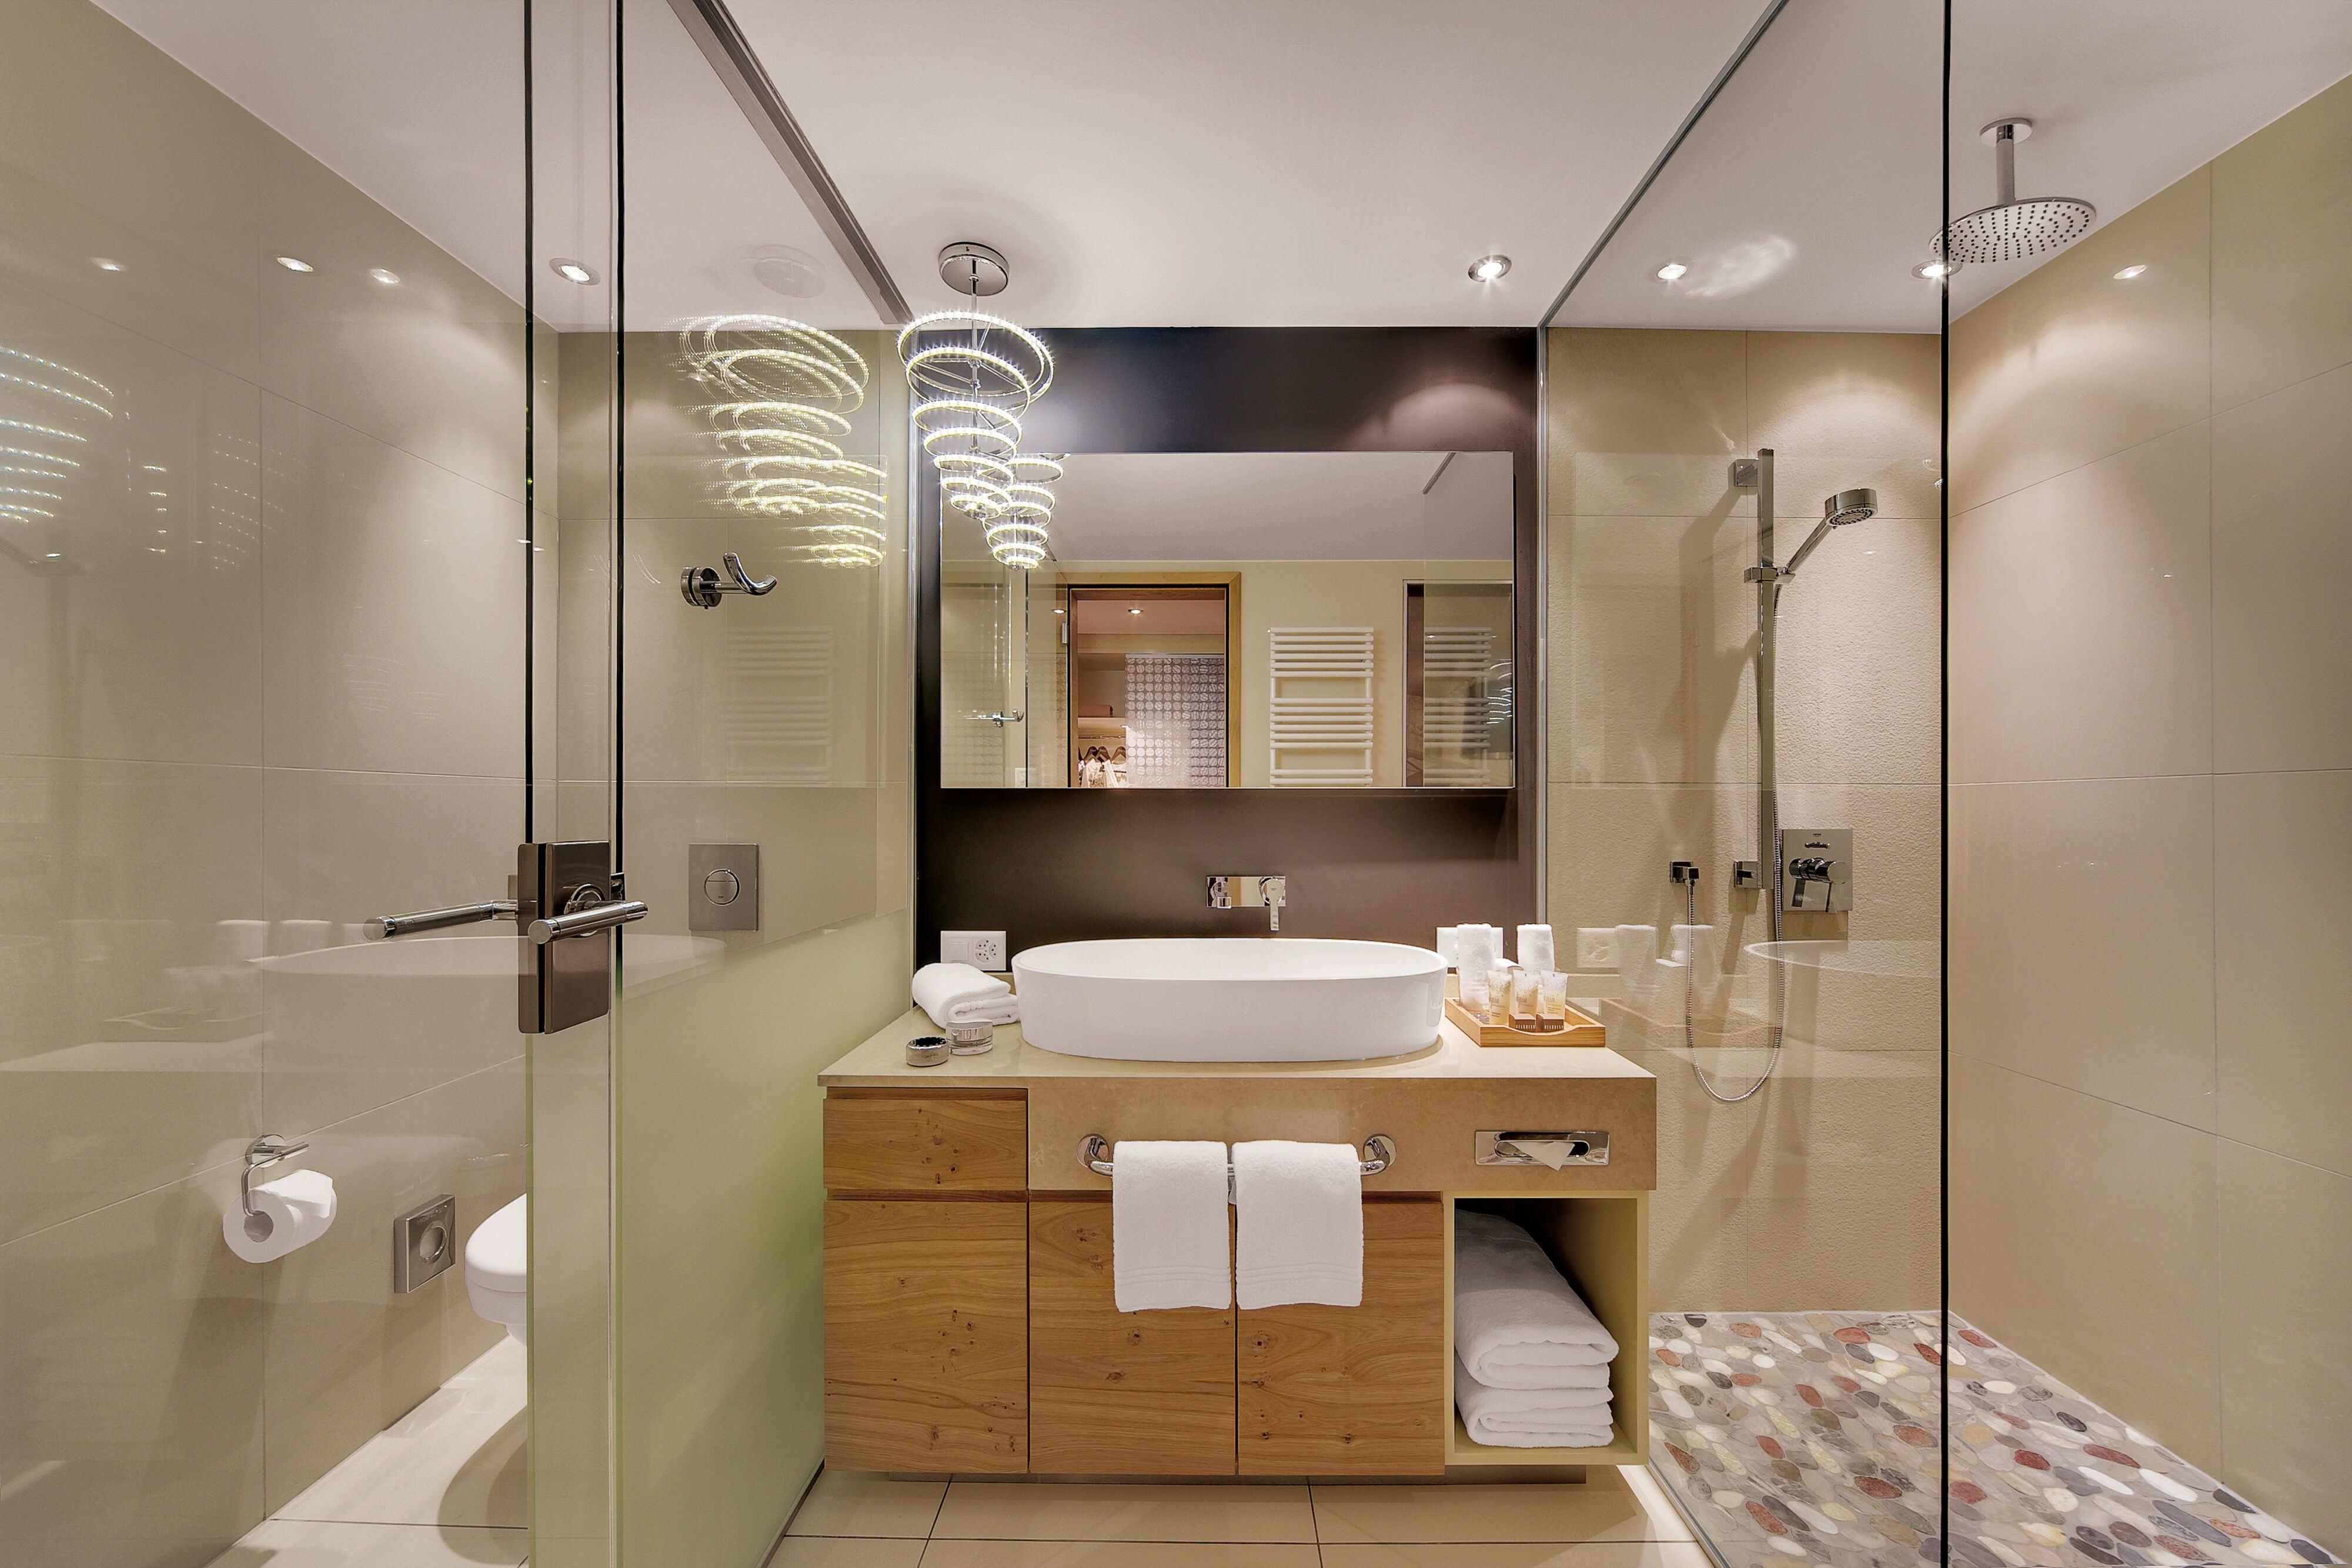 Small room bathroom